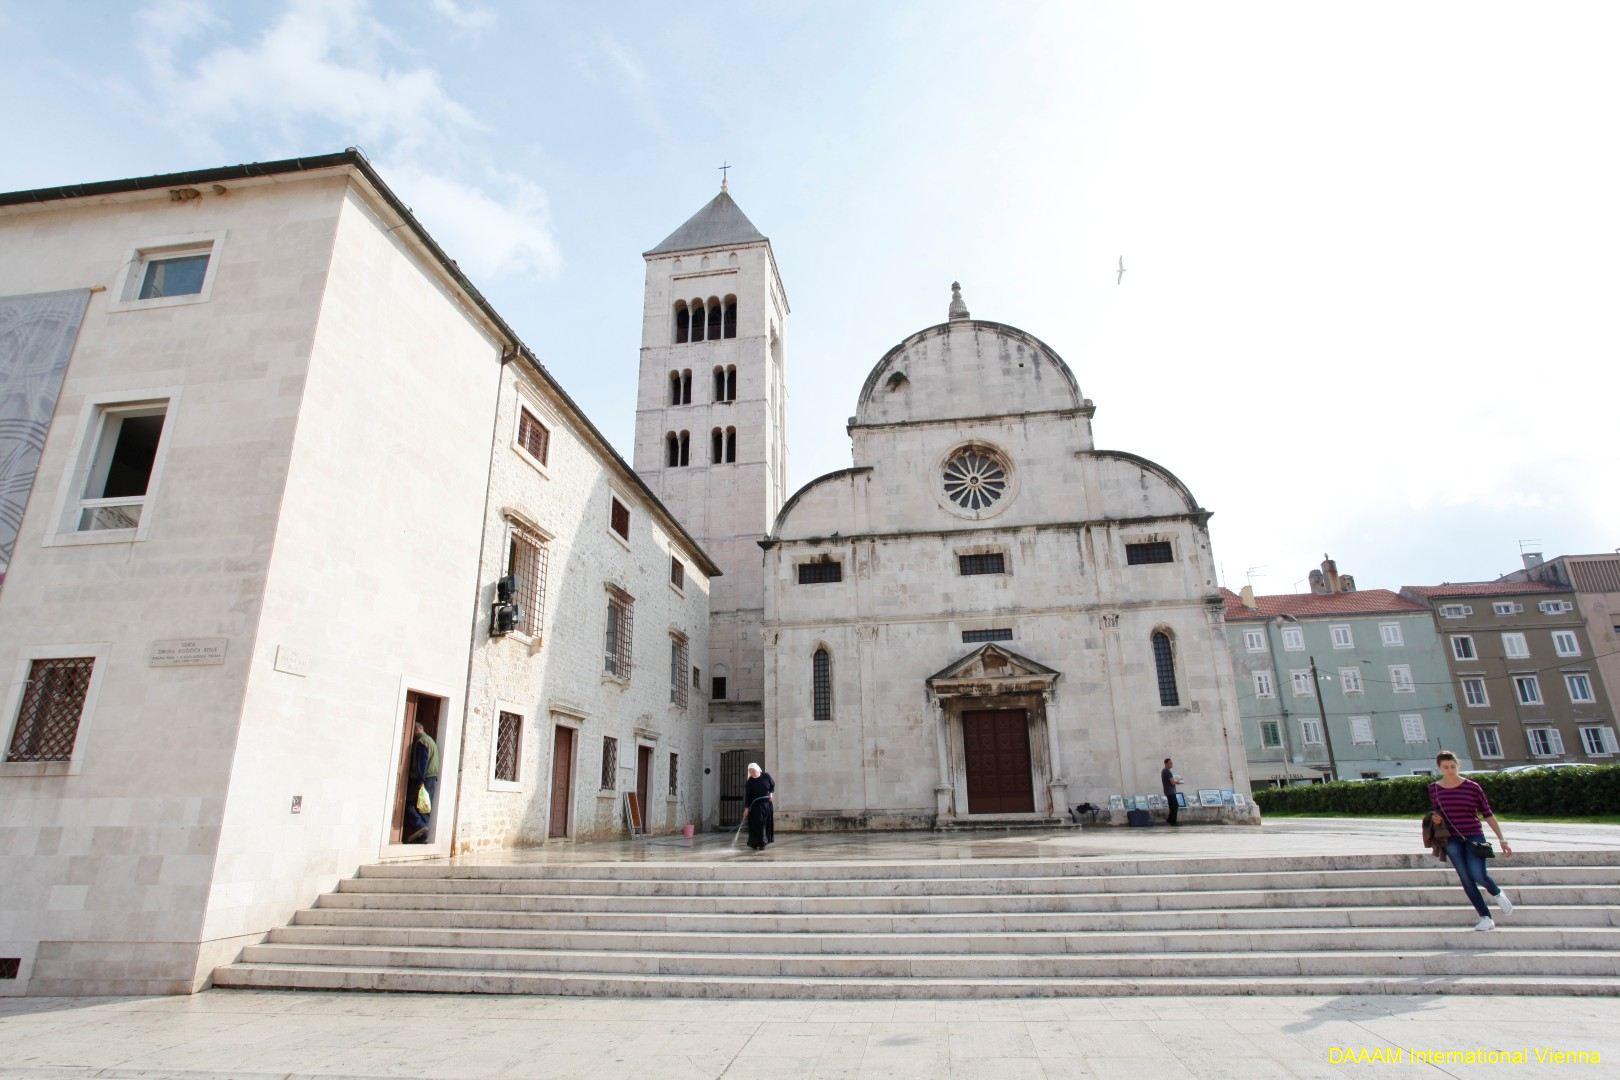 DAAAM_2012_Zadar_00_Zadar_City_068